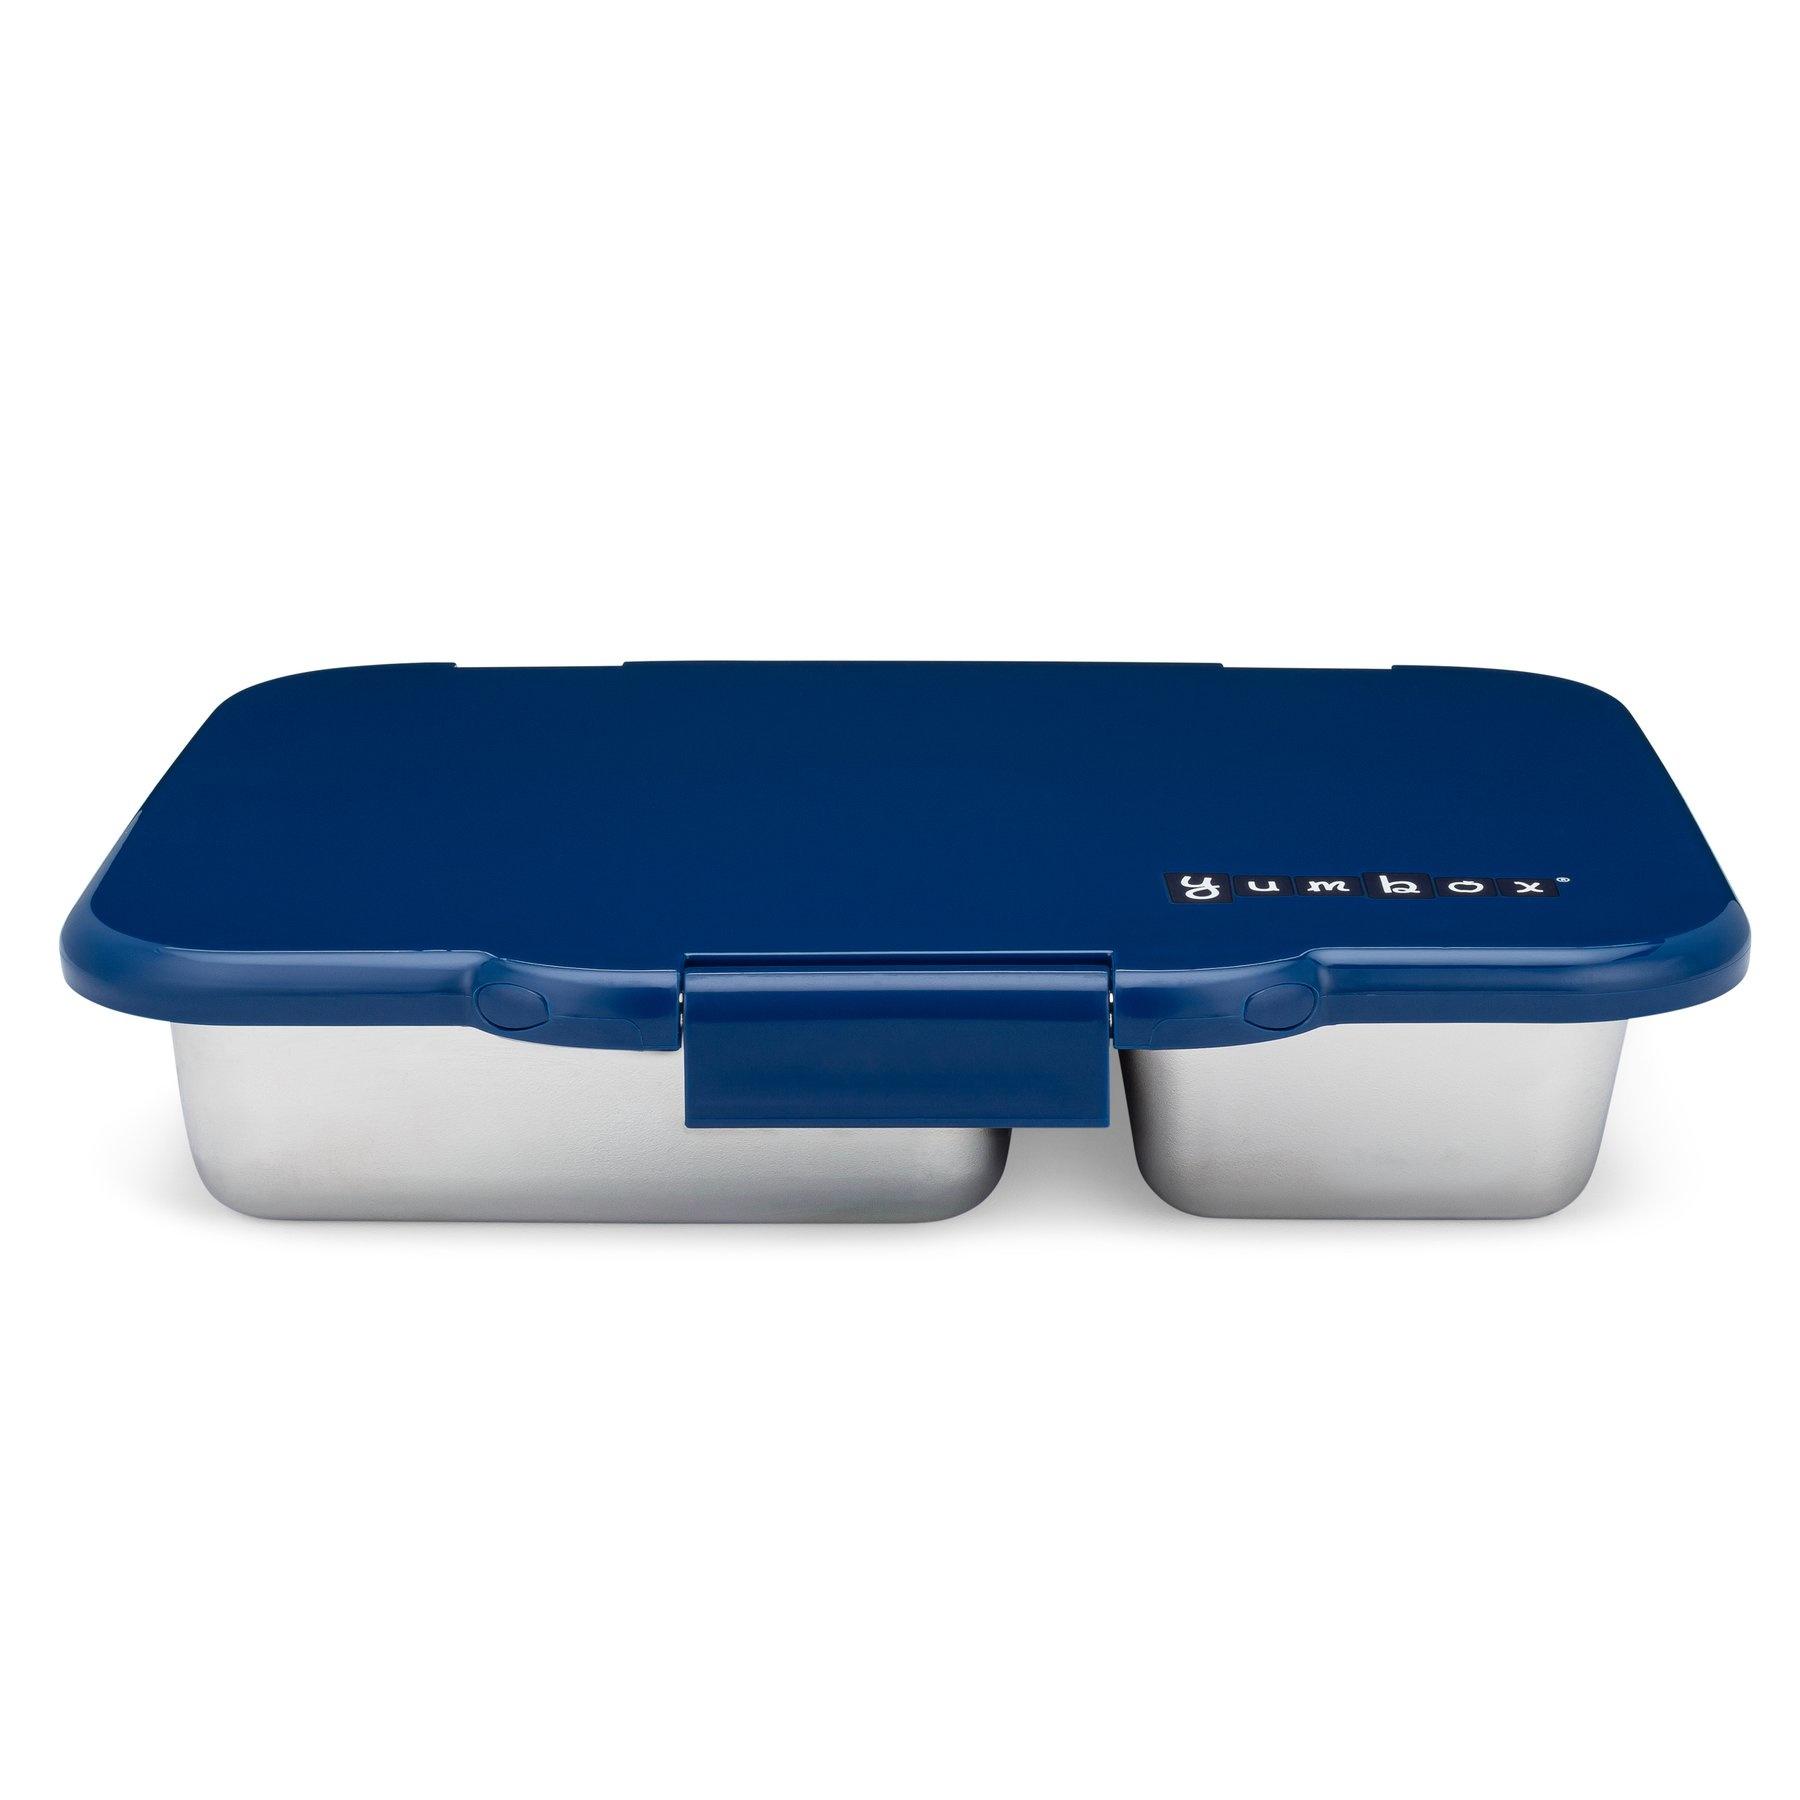 Stainless steel leakproof Bento Box - Santa Fe blue-4